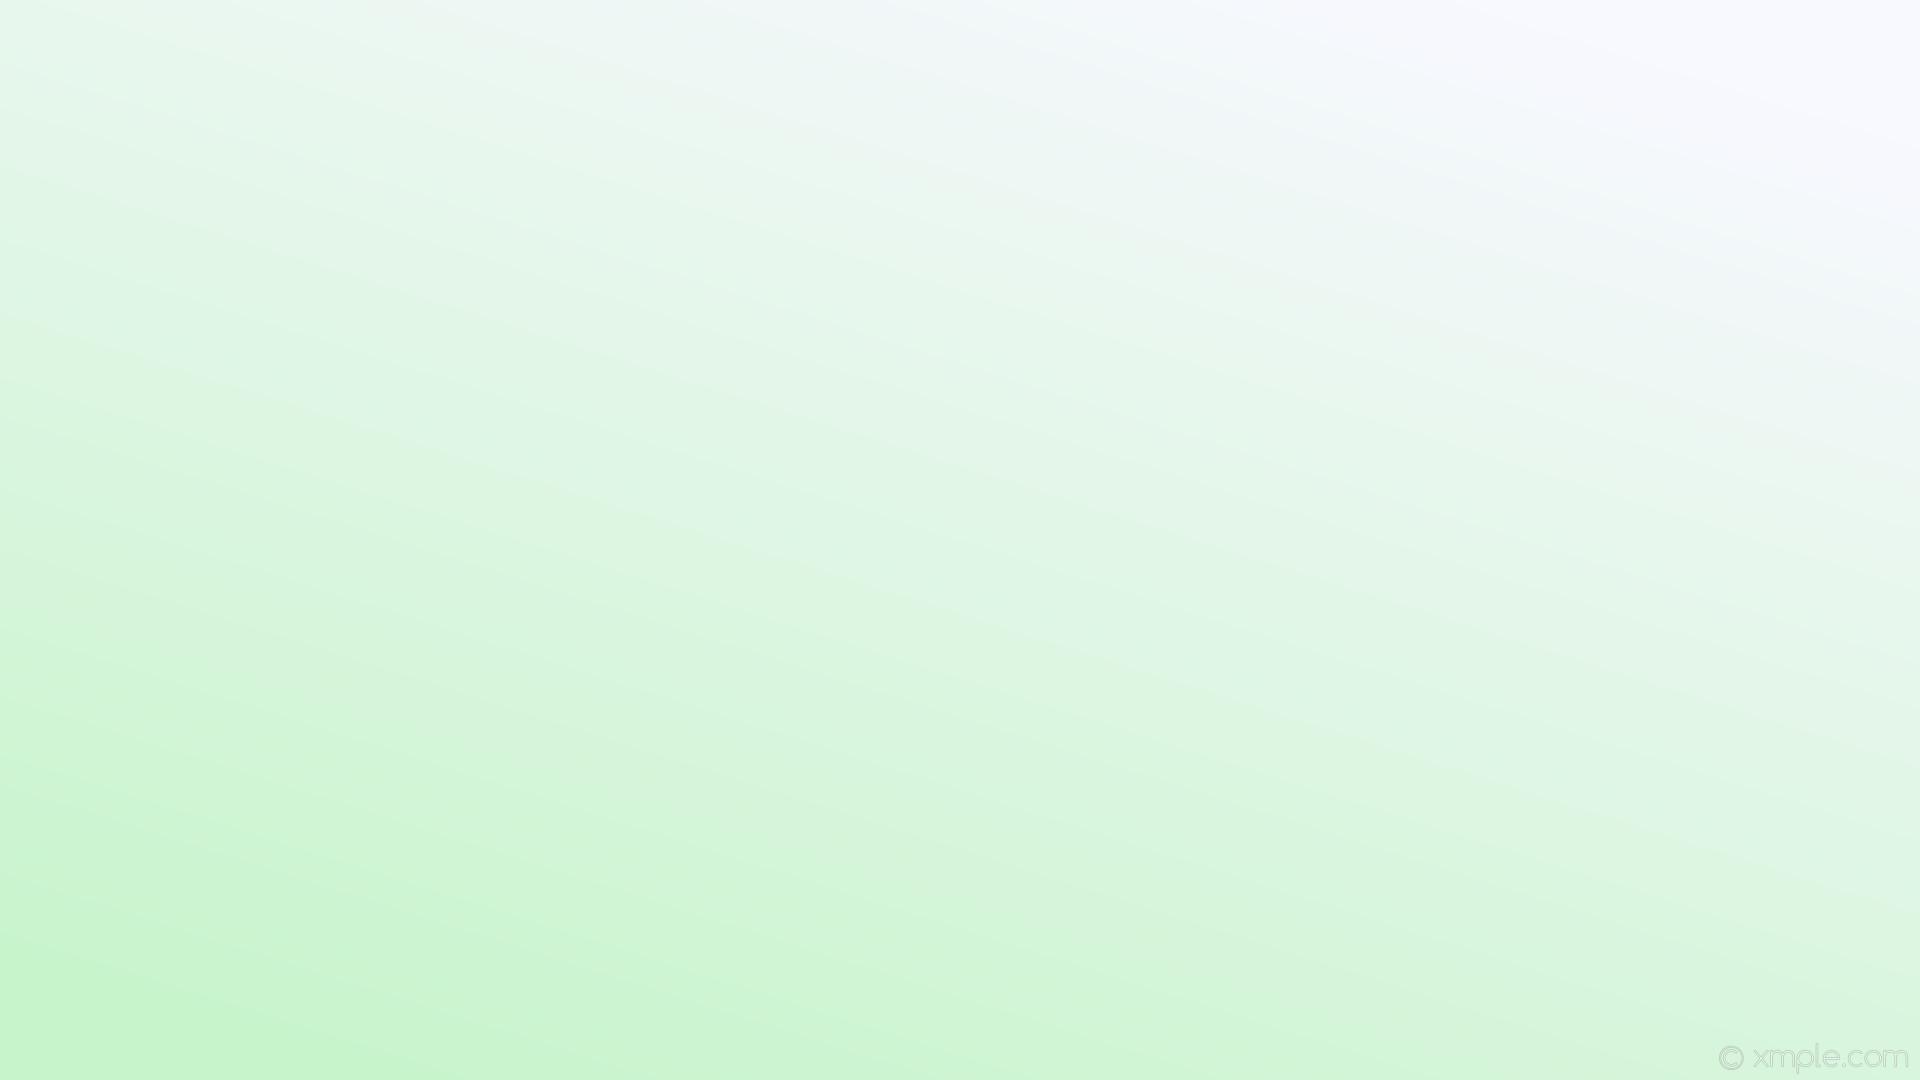 wallpaper linear green gradient white light green ghost white #c8f4cc  #f8f8ff 225°